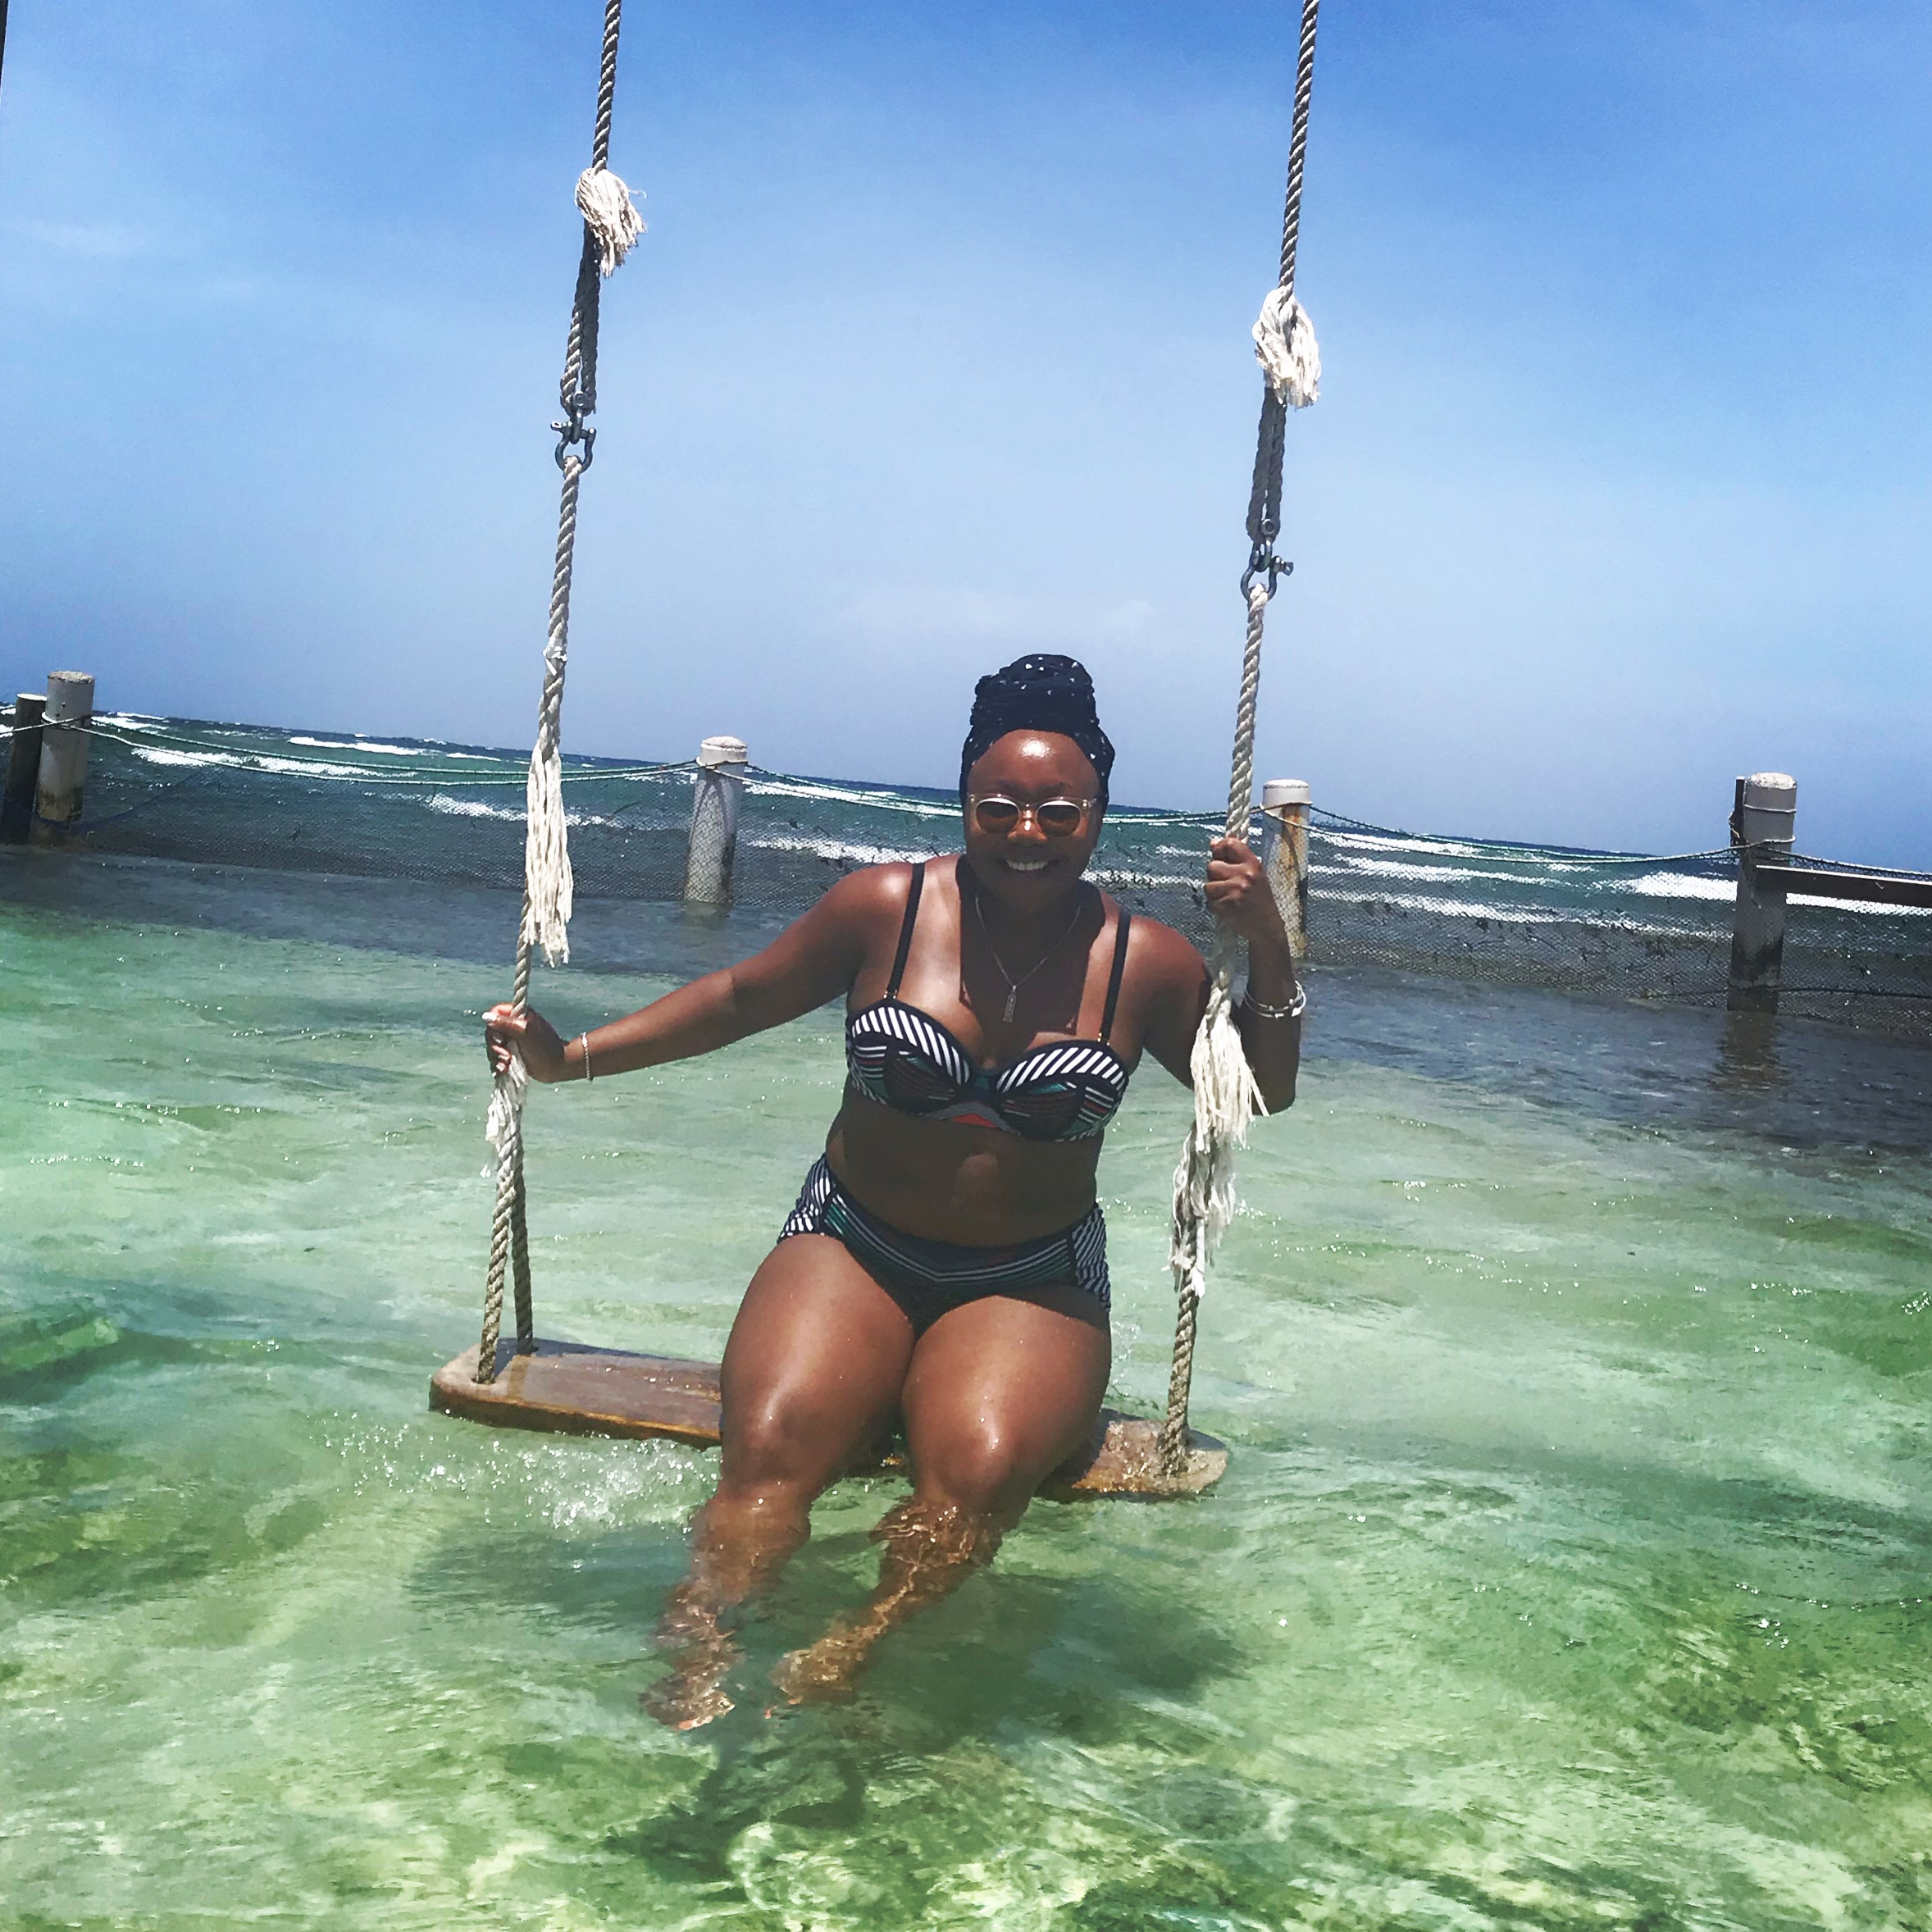 swinging into the summer